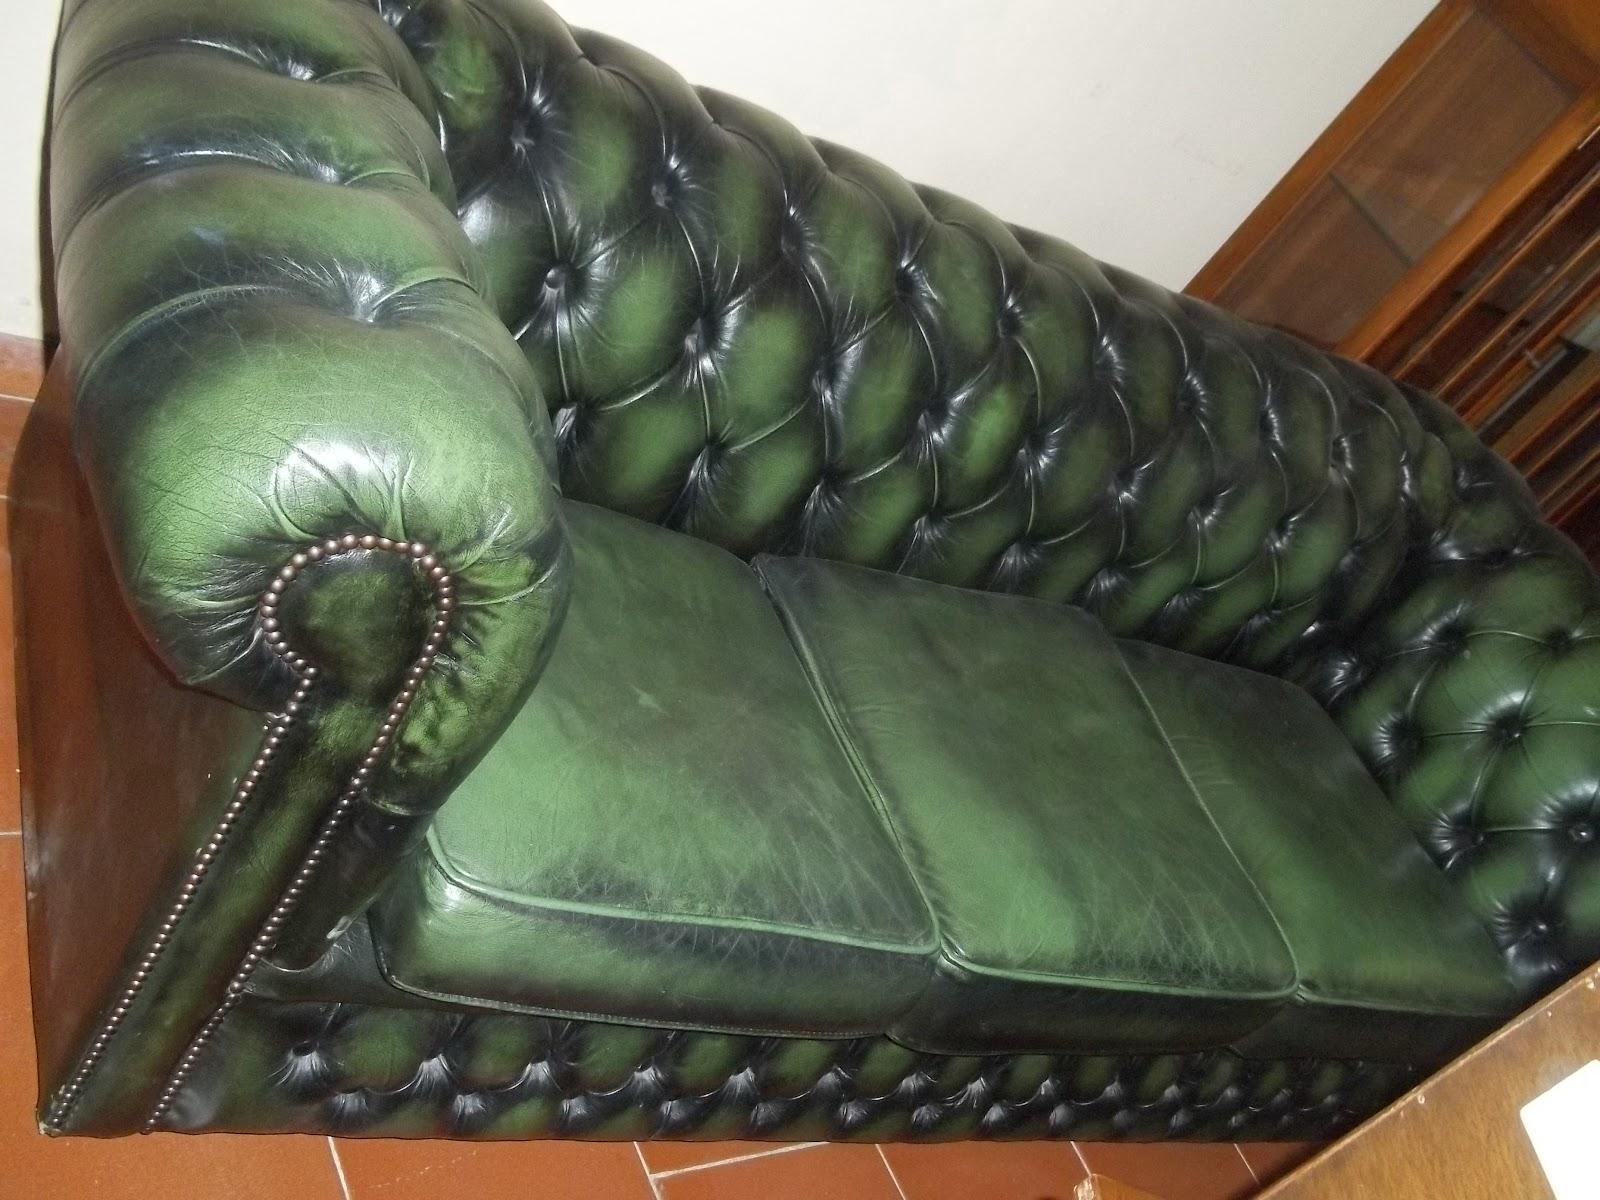 M a g antichit divano chester verde for Divano in inglese